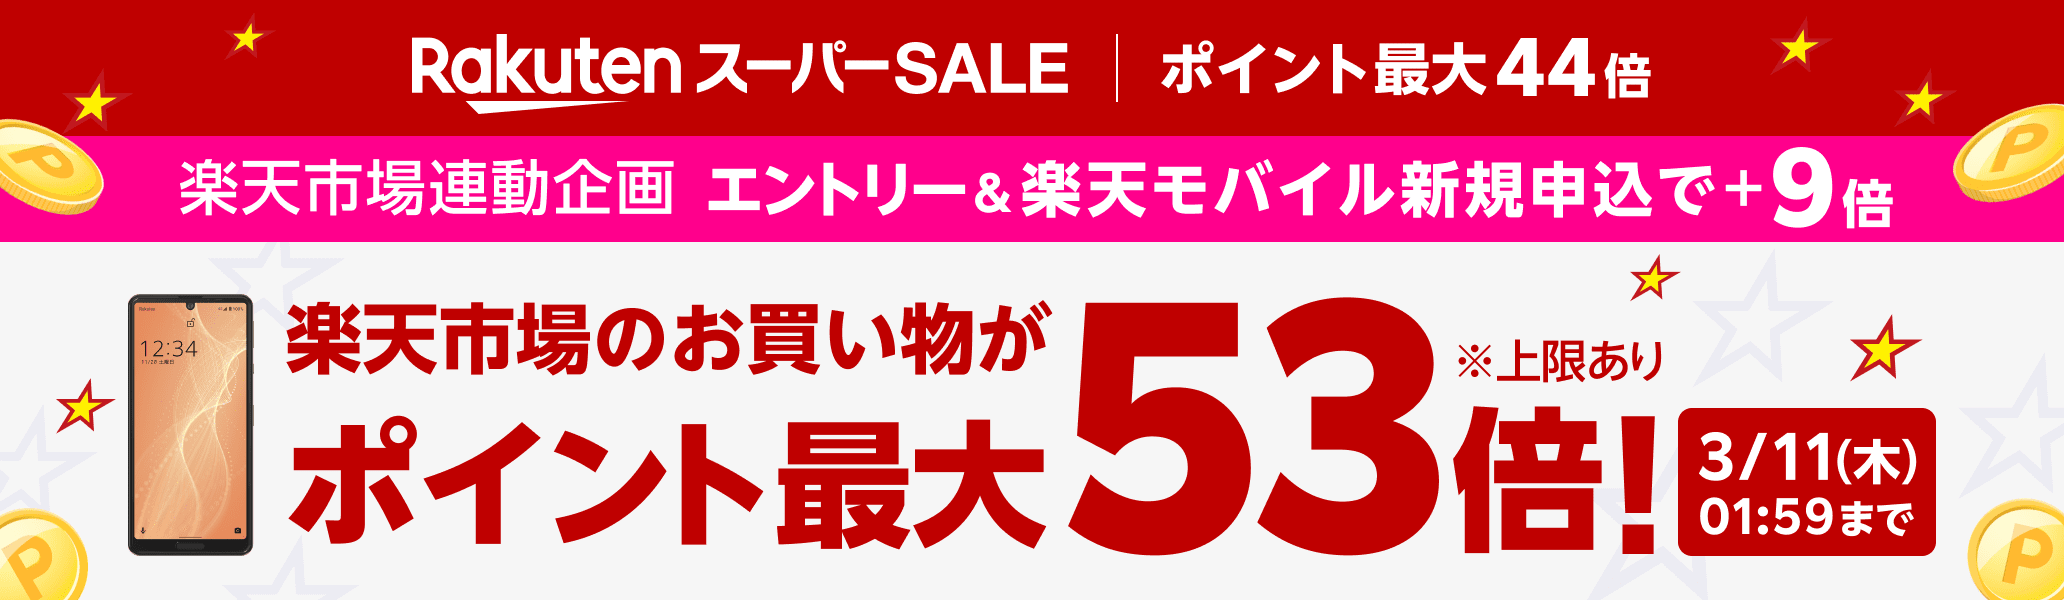 https://network.mobile.rakuten.co.jp/assets/img/bnr/campaign-ss-1032-300.png?210309